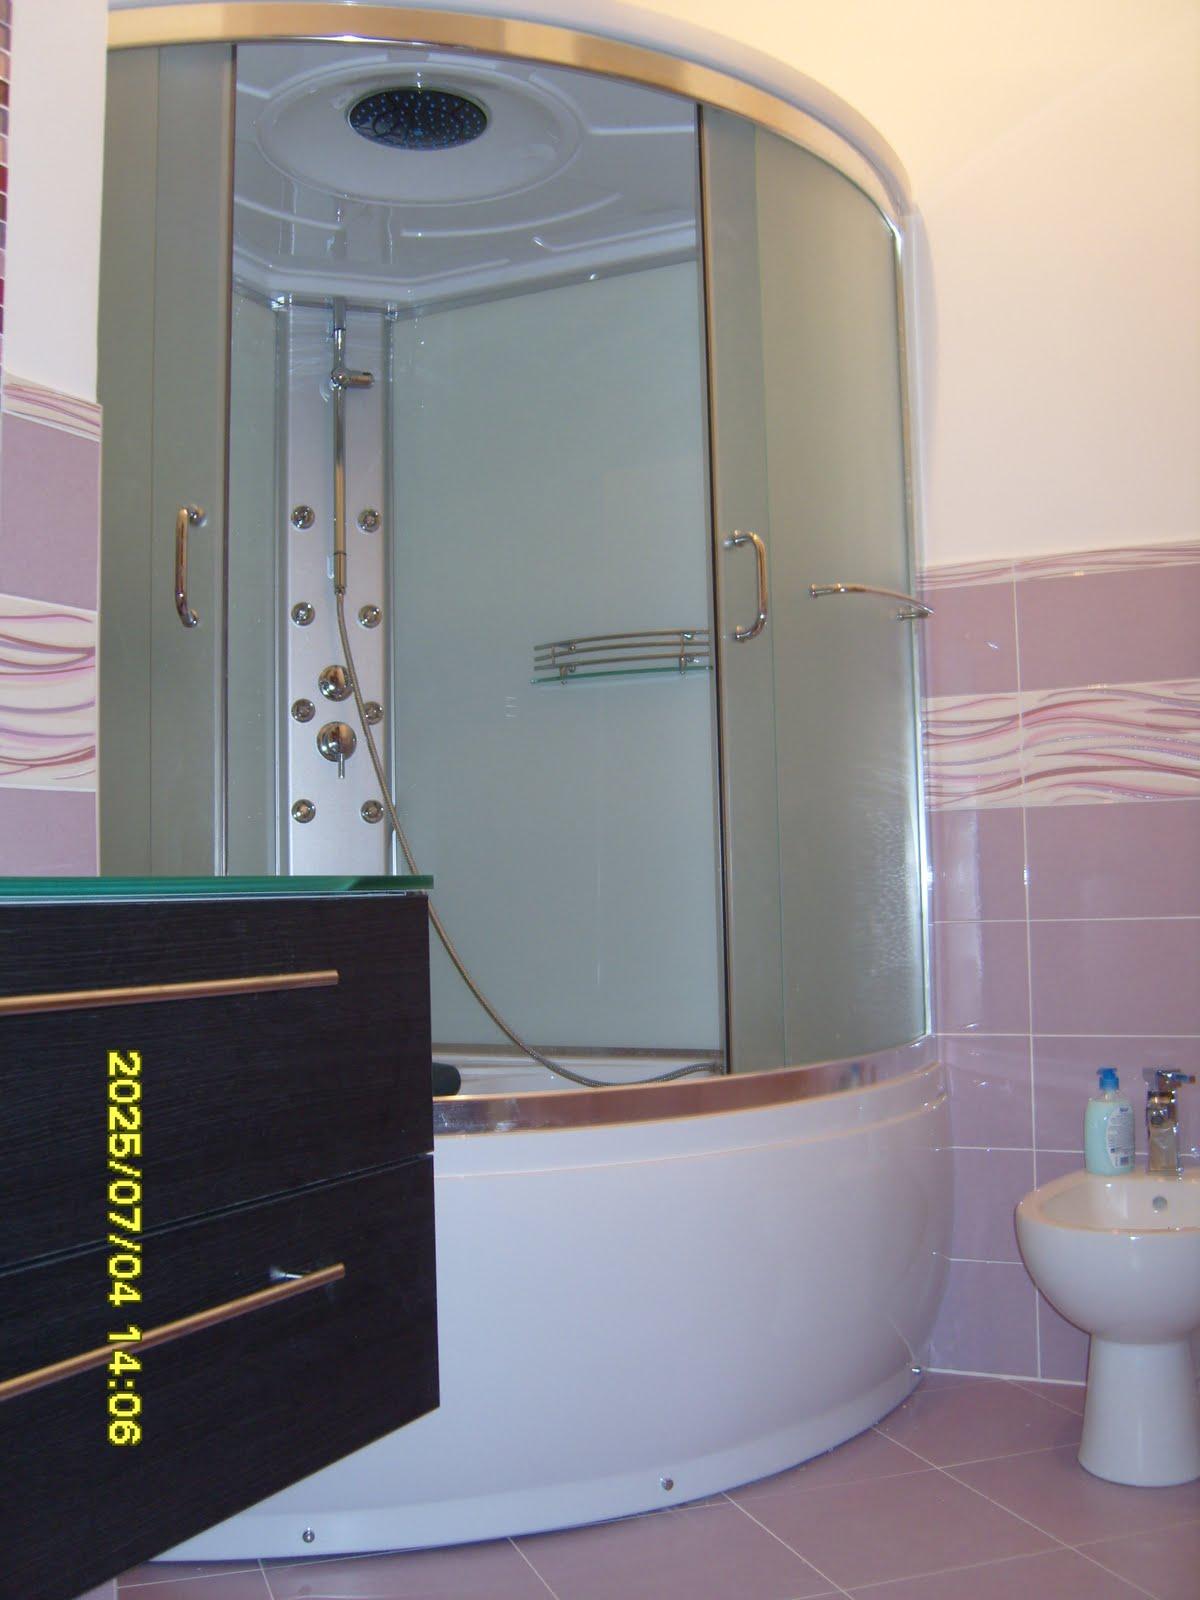 Rifare il bagno idee ip12 regardsdefemmes - Rifare il bagno idee ...